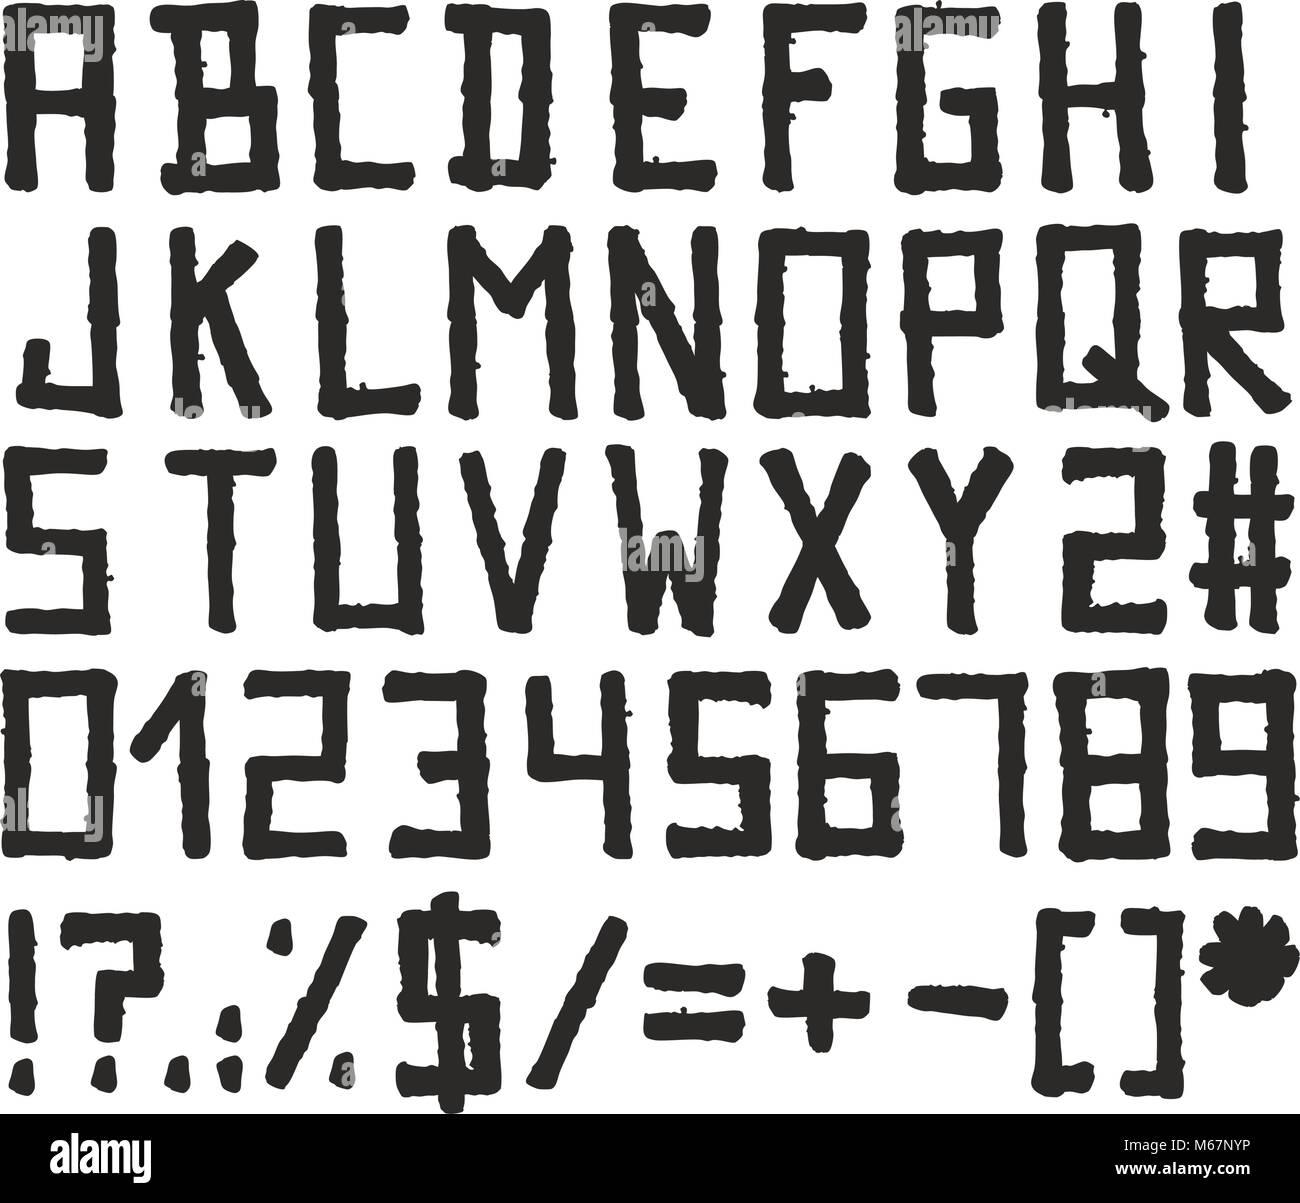 Alphabet Stencil Stock Photos & Alphabet Stencil Stock